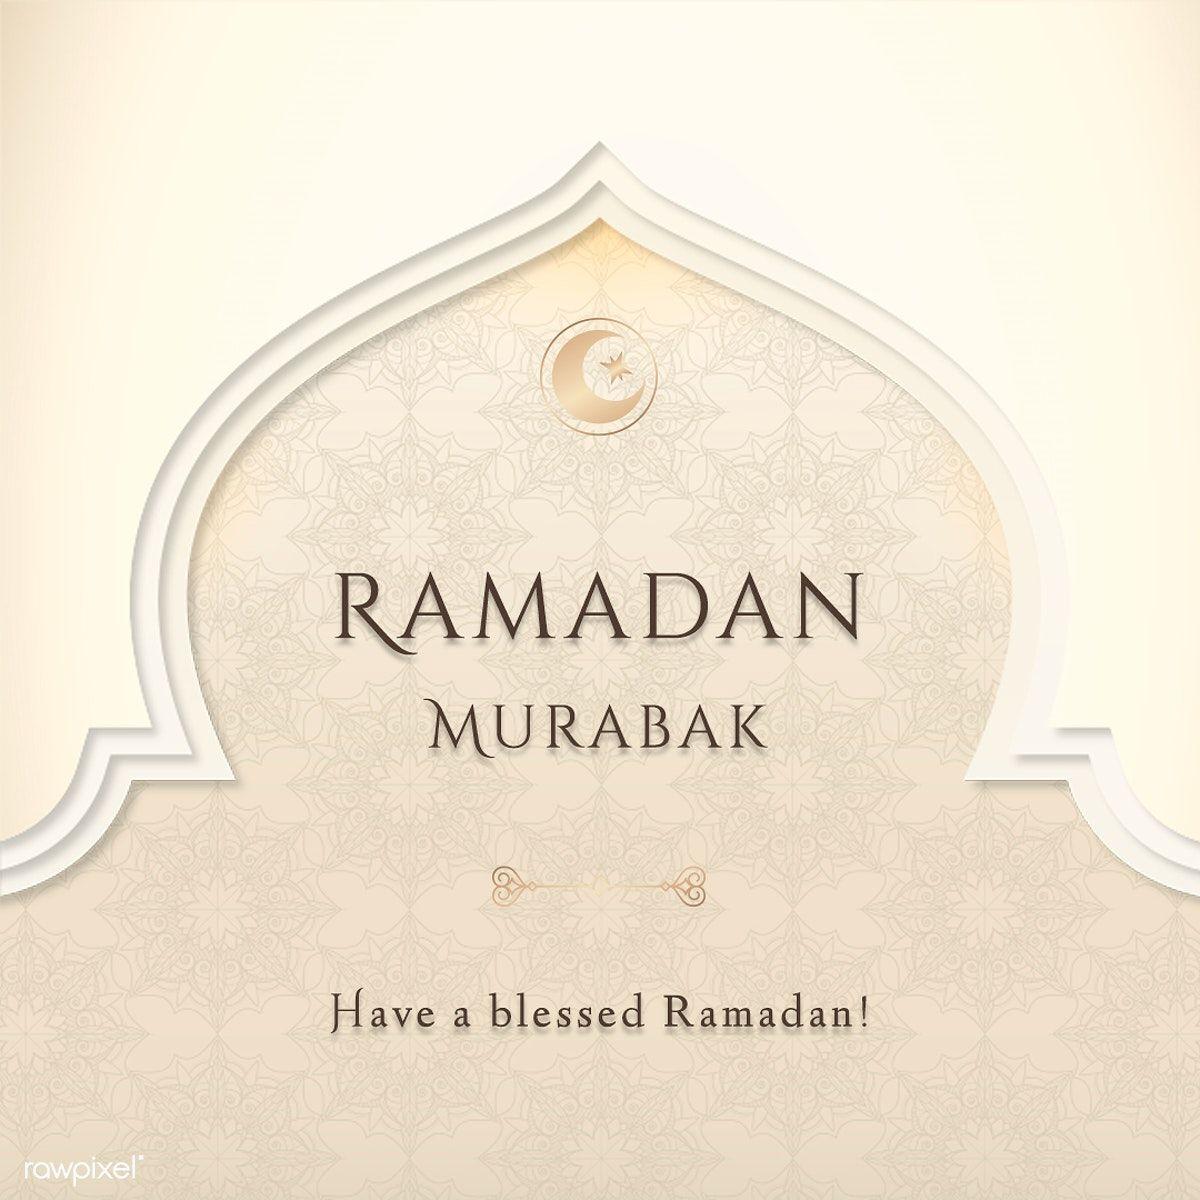 Download Premium Illustration Of Festive Ramadan Mubarak Blessing Card In 2020 Eid Mubarak Greeting Cards Eid Mubarak Greetings Ramadan